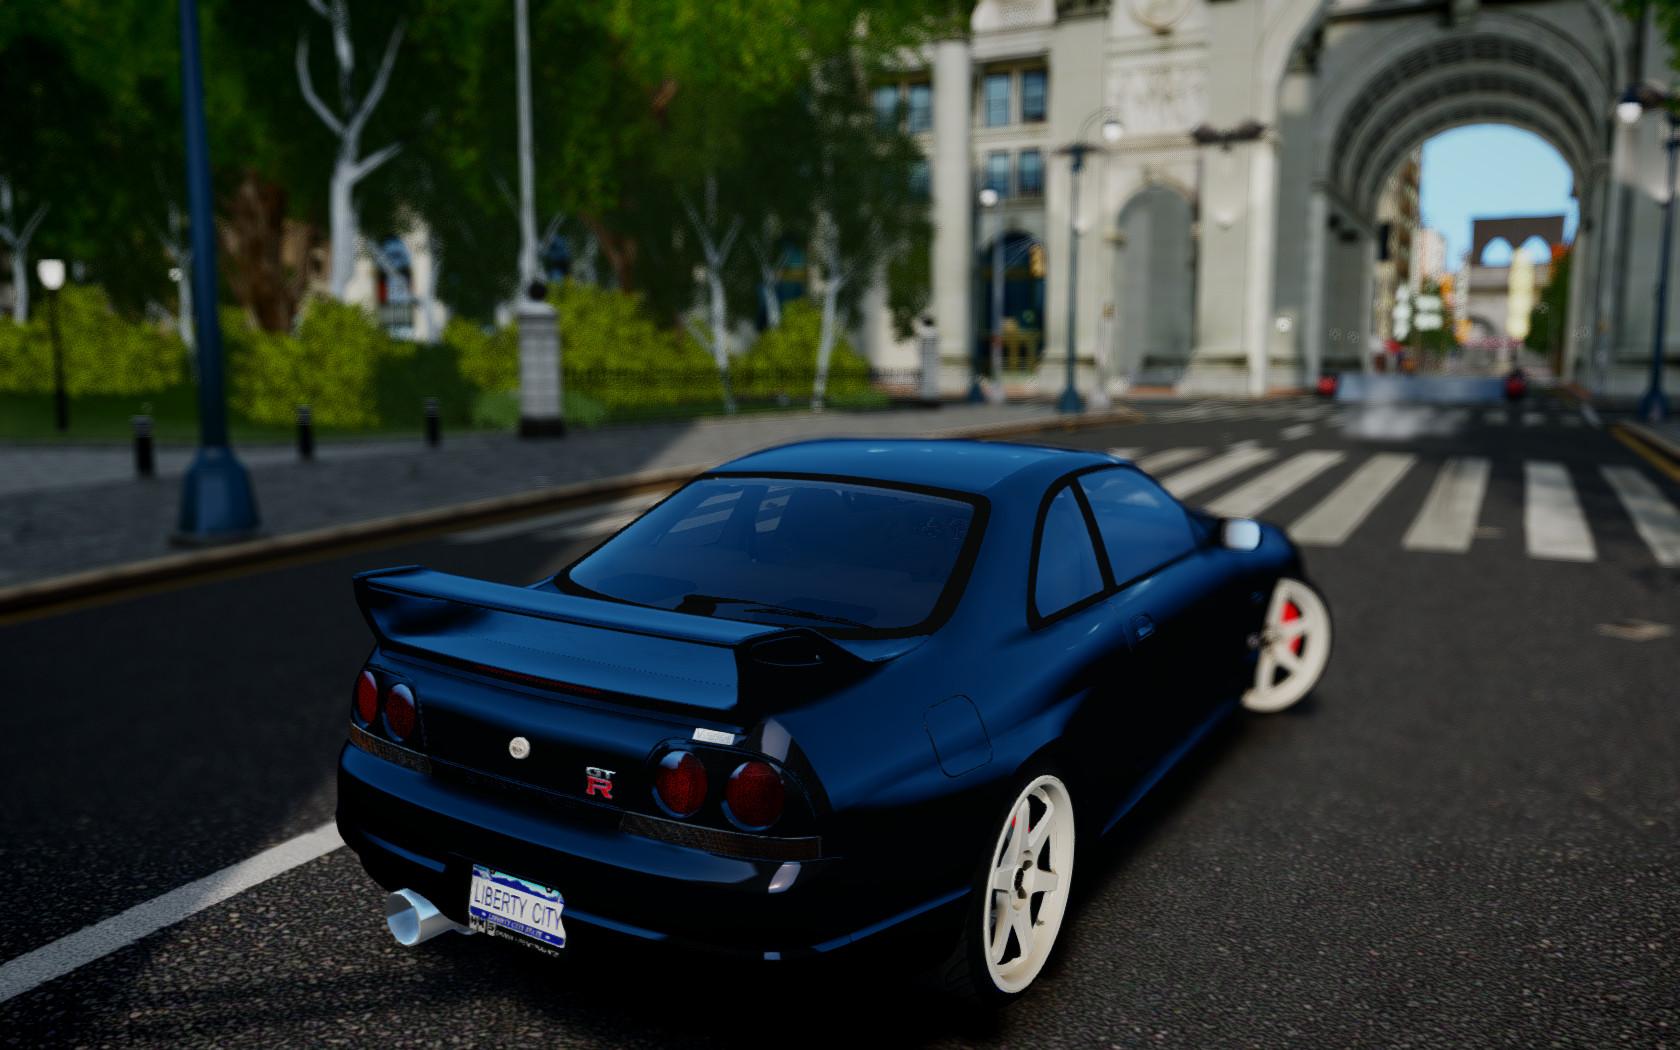 Nissan Skyline R33 GTR VSpec by CreaT1Ve11 on DeviantArt